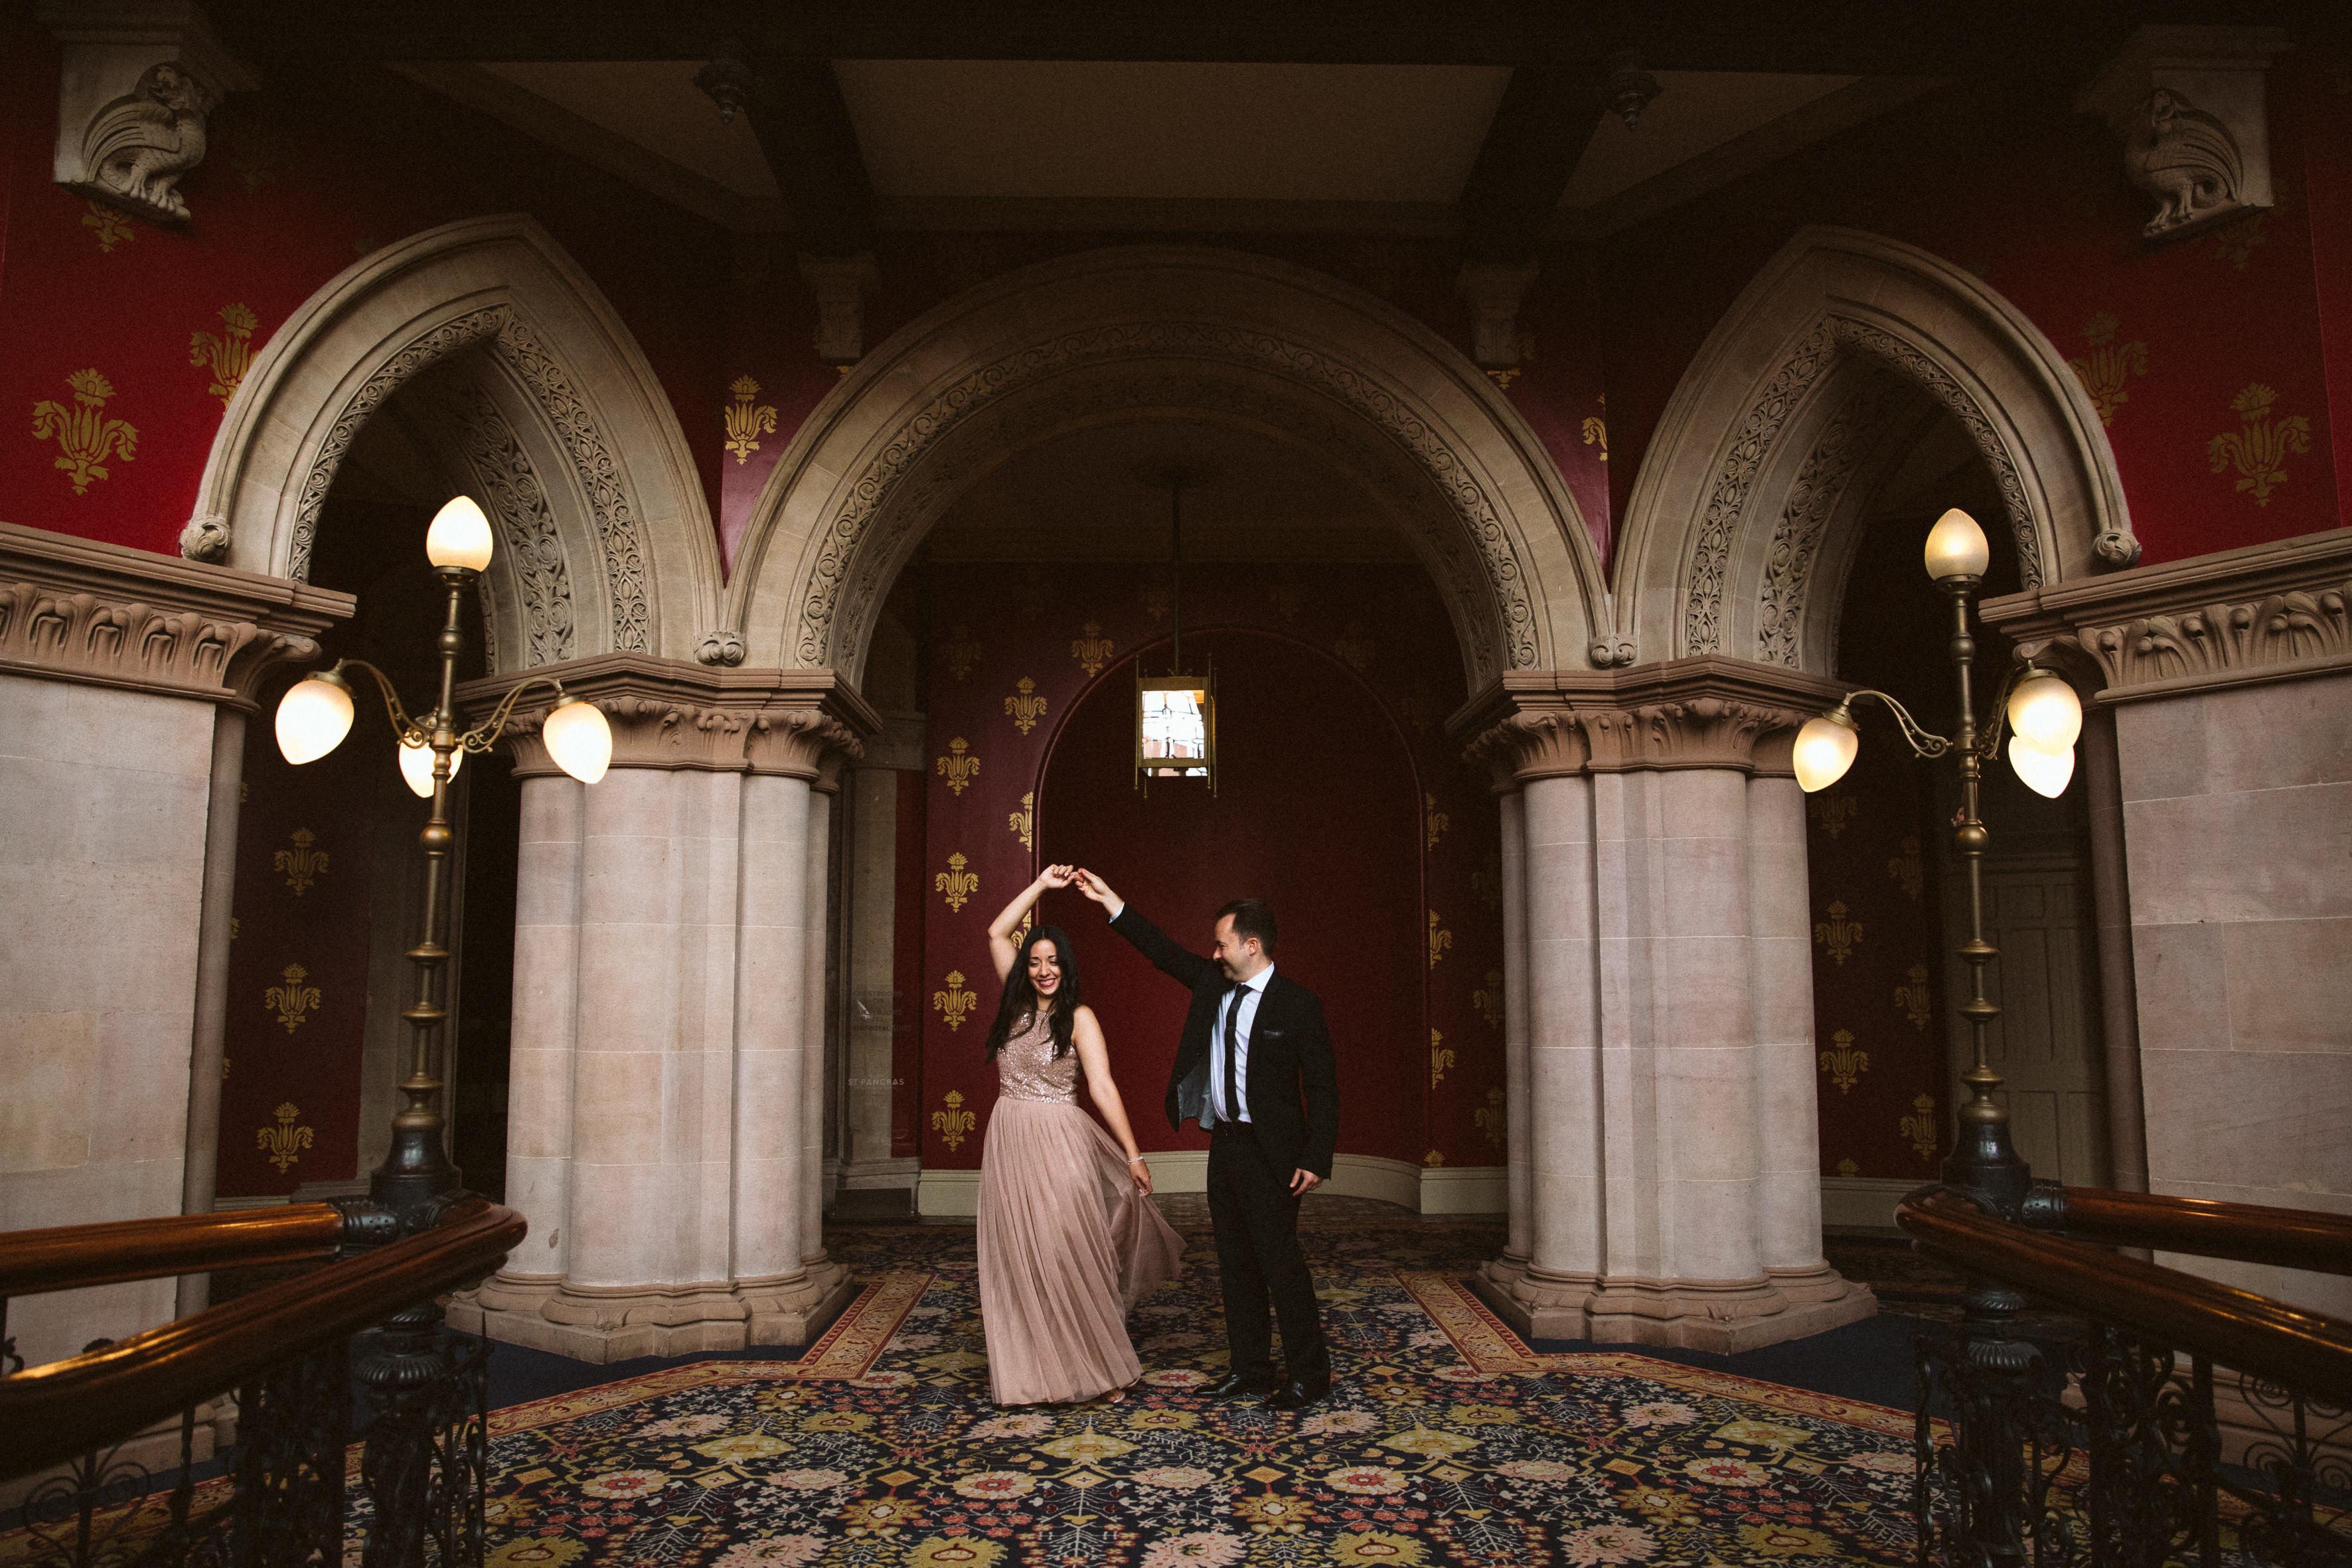 intimate wedding photography st pancrass hotel london